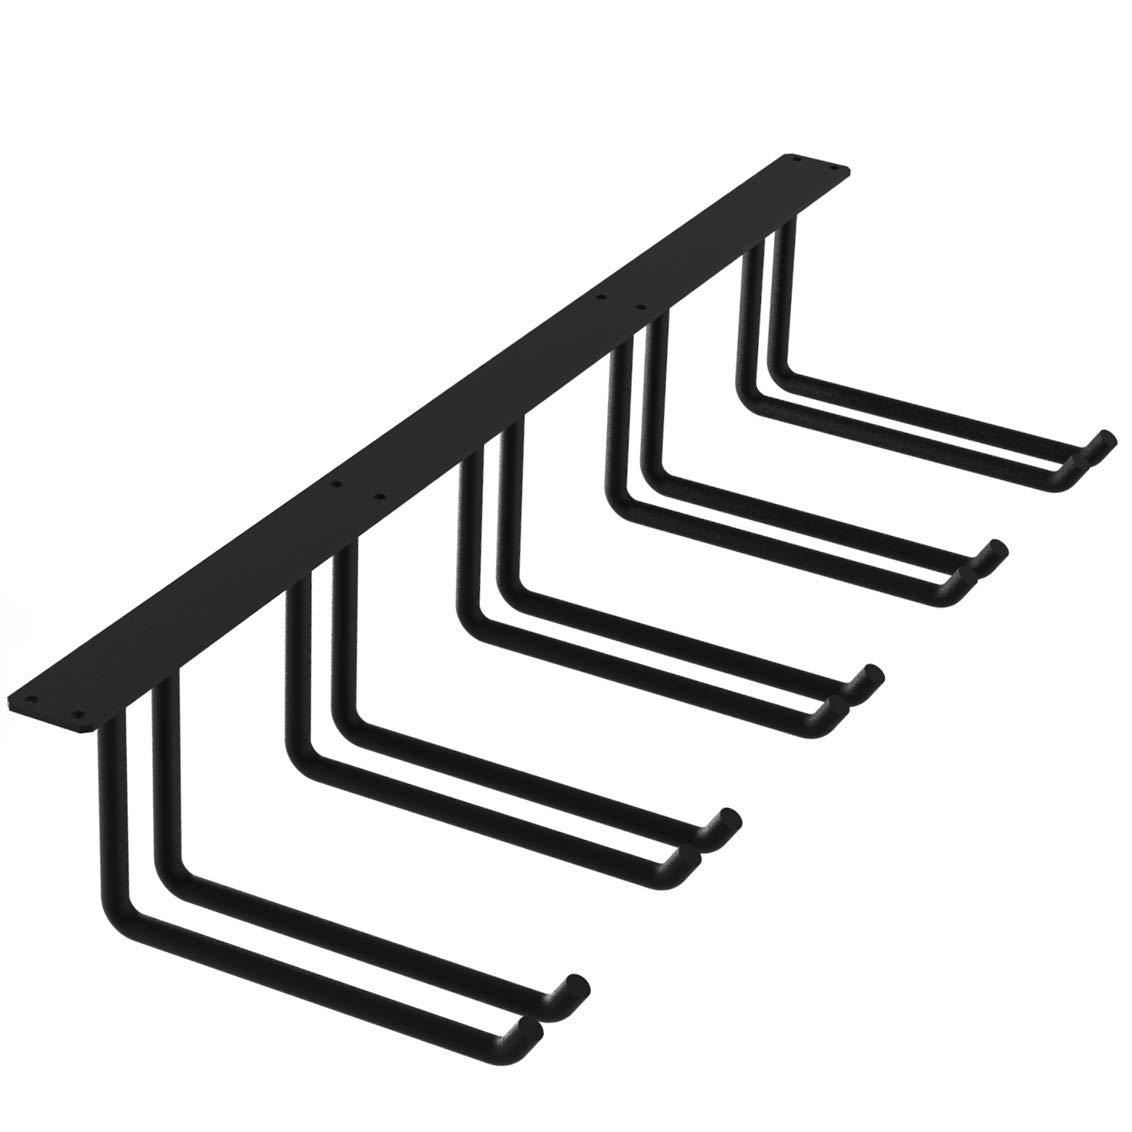 FRMSAET Ceiling Mounted Storage Heavy Duty Metal 48 inch Overhead Garage Storage Rack Tools Holder Hanger Garage Bracket Wall Organization Storage Shelf System-Easy to Install Large, 1 Pack